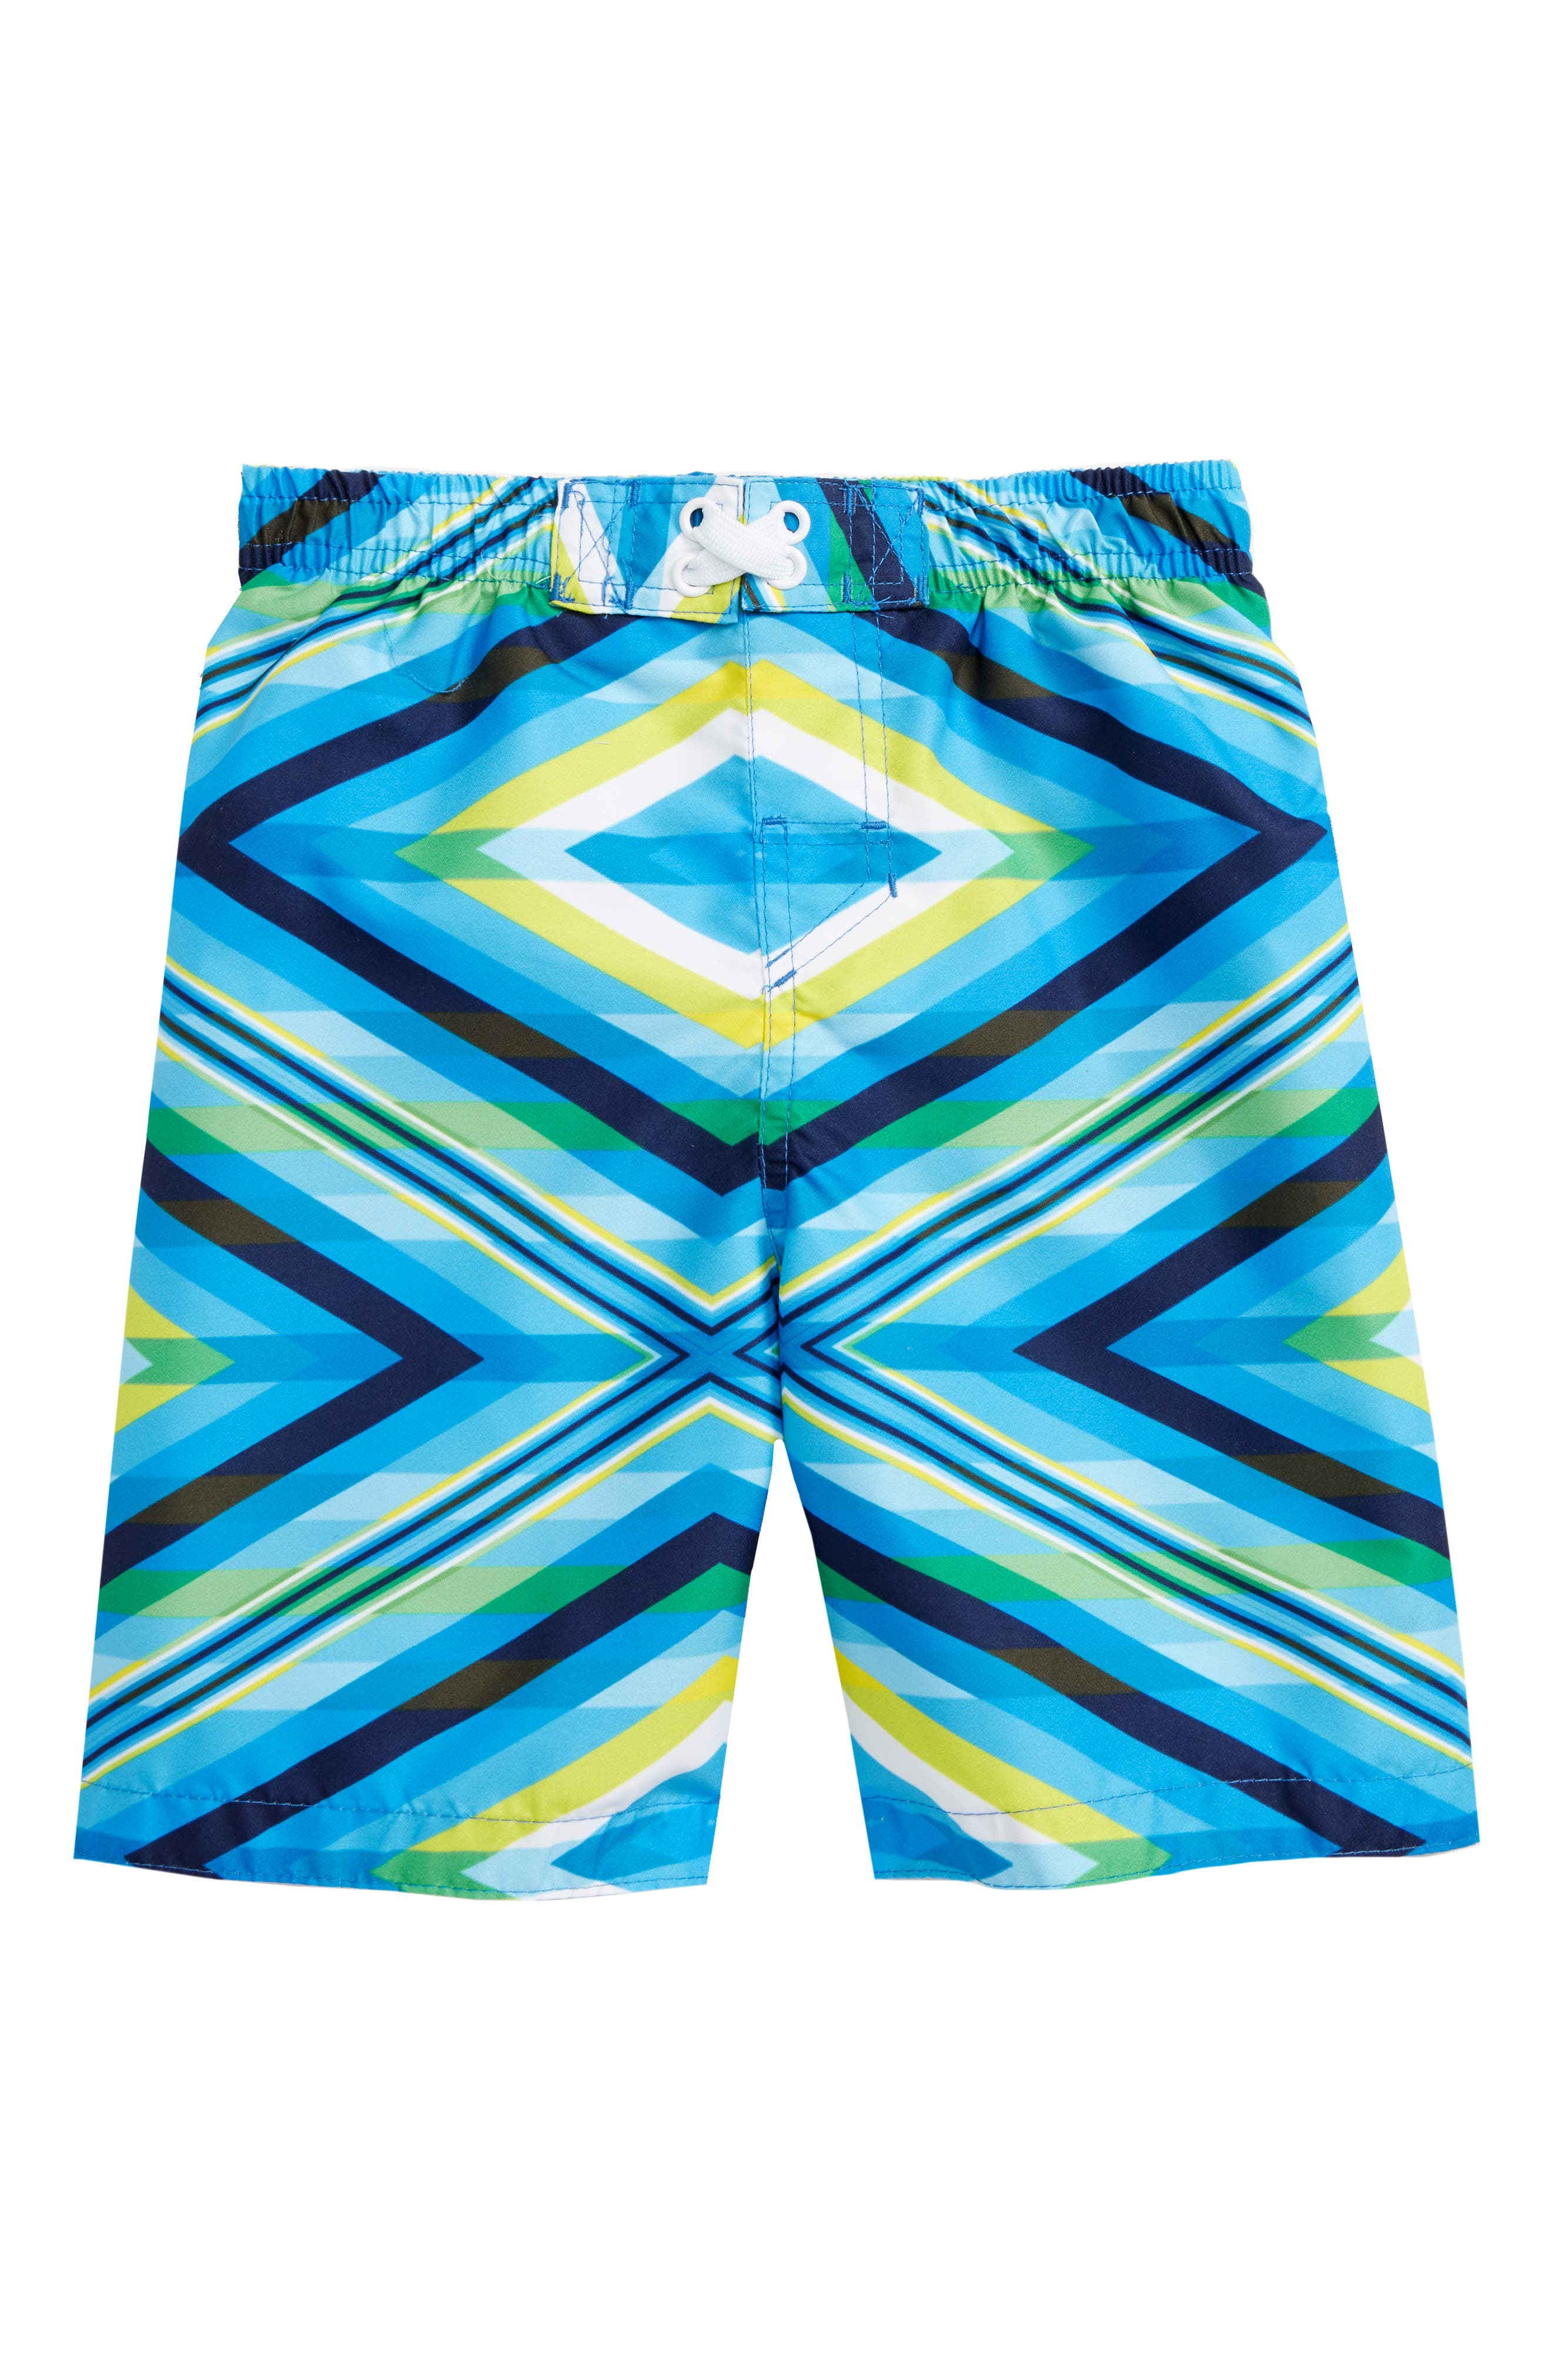 Geo Mirage Swim Trunks,                         Main,                         color, Blue/ Yellow